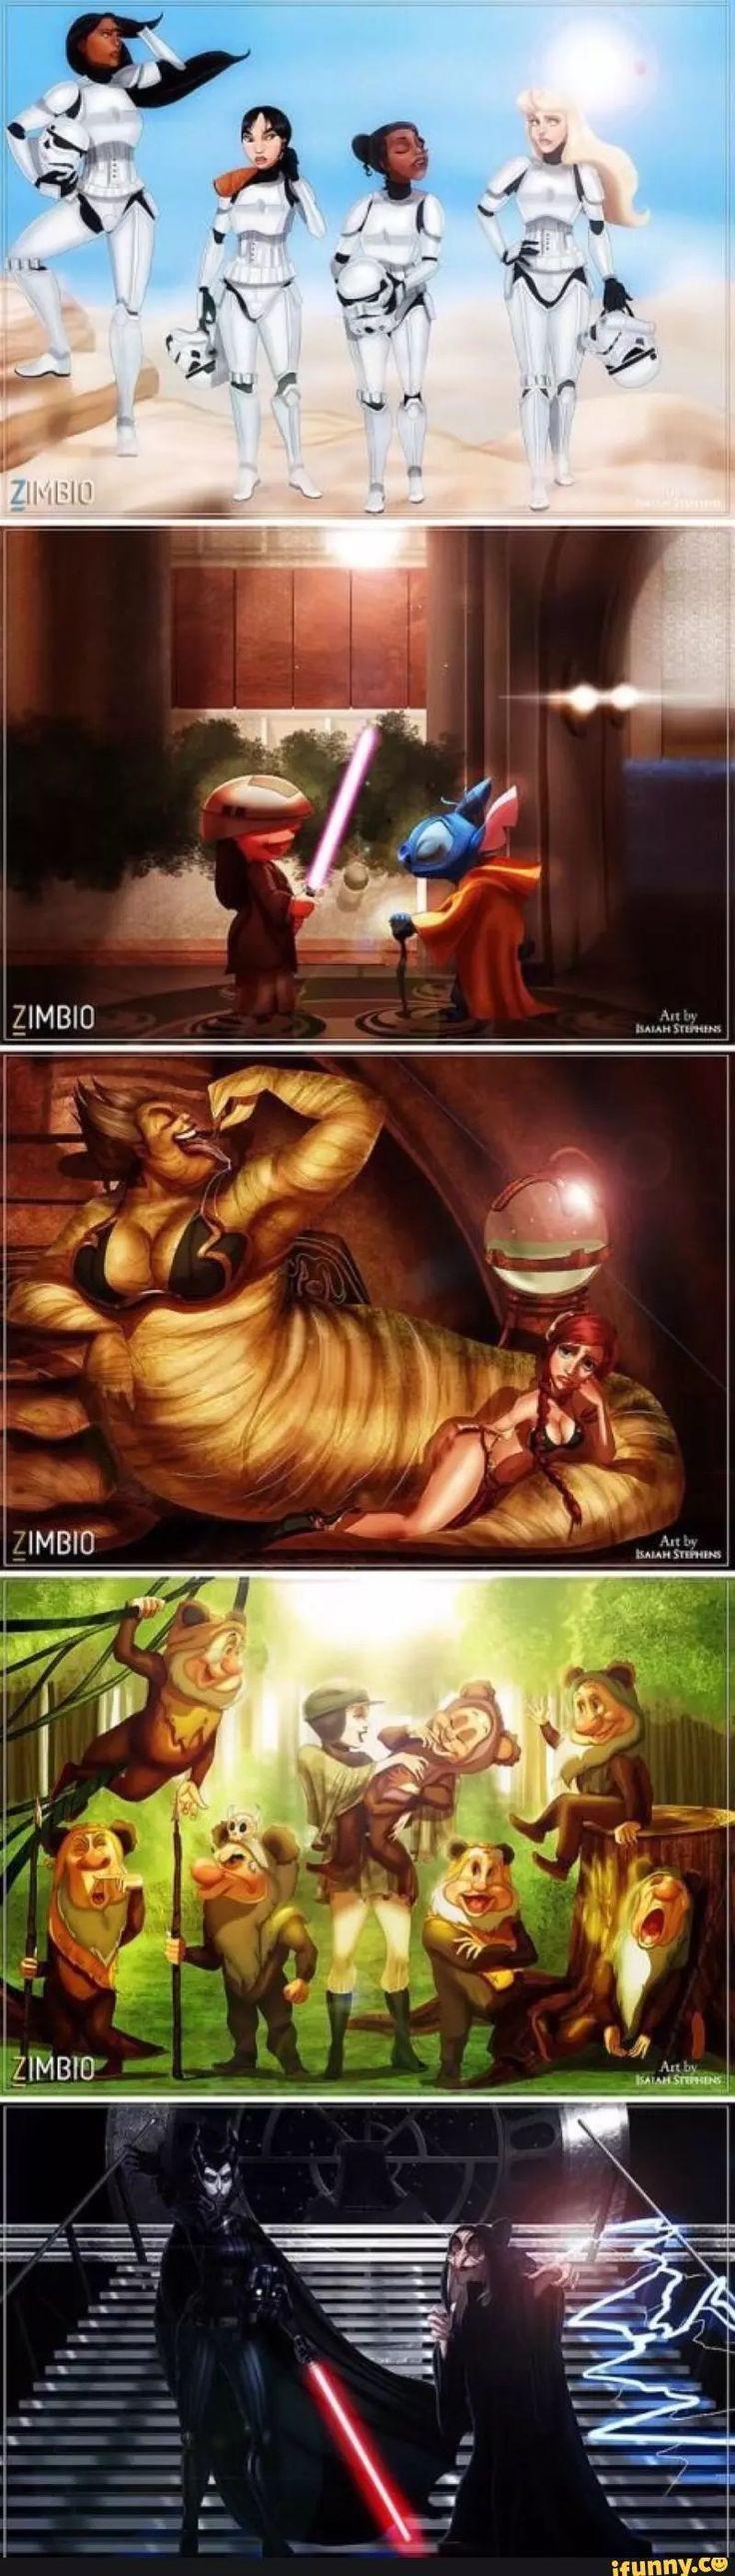 Disney Animation and Star Wars mash-up